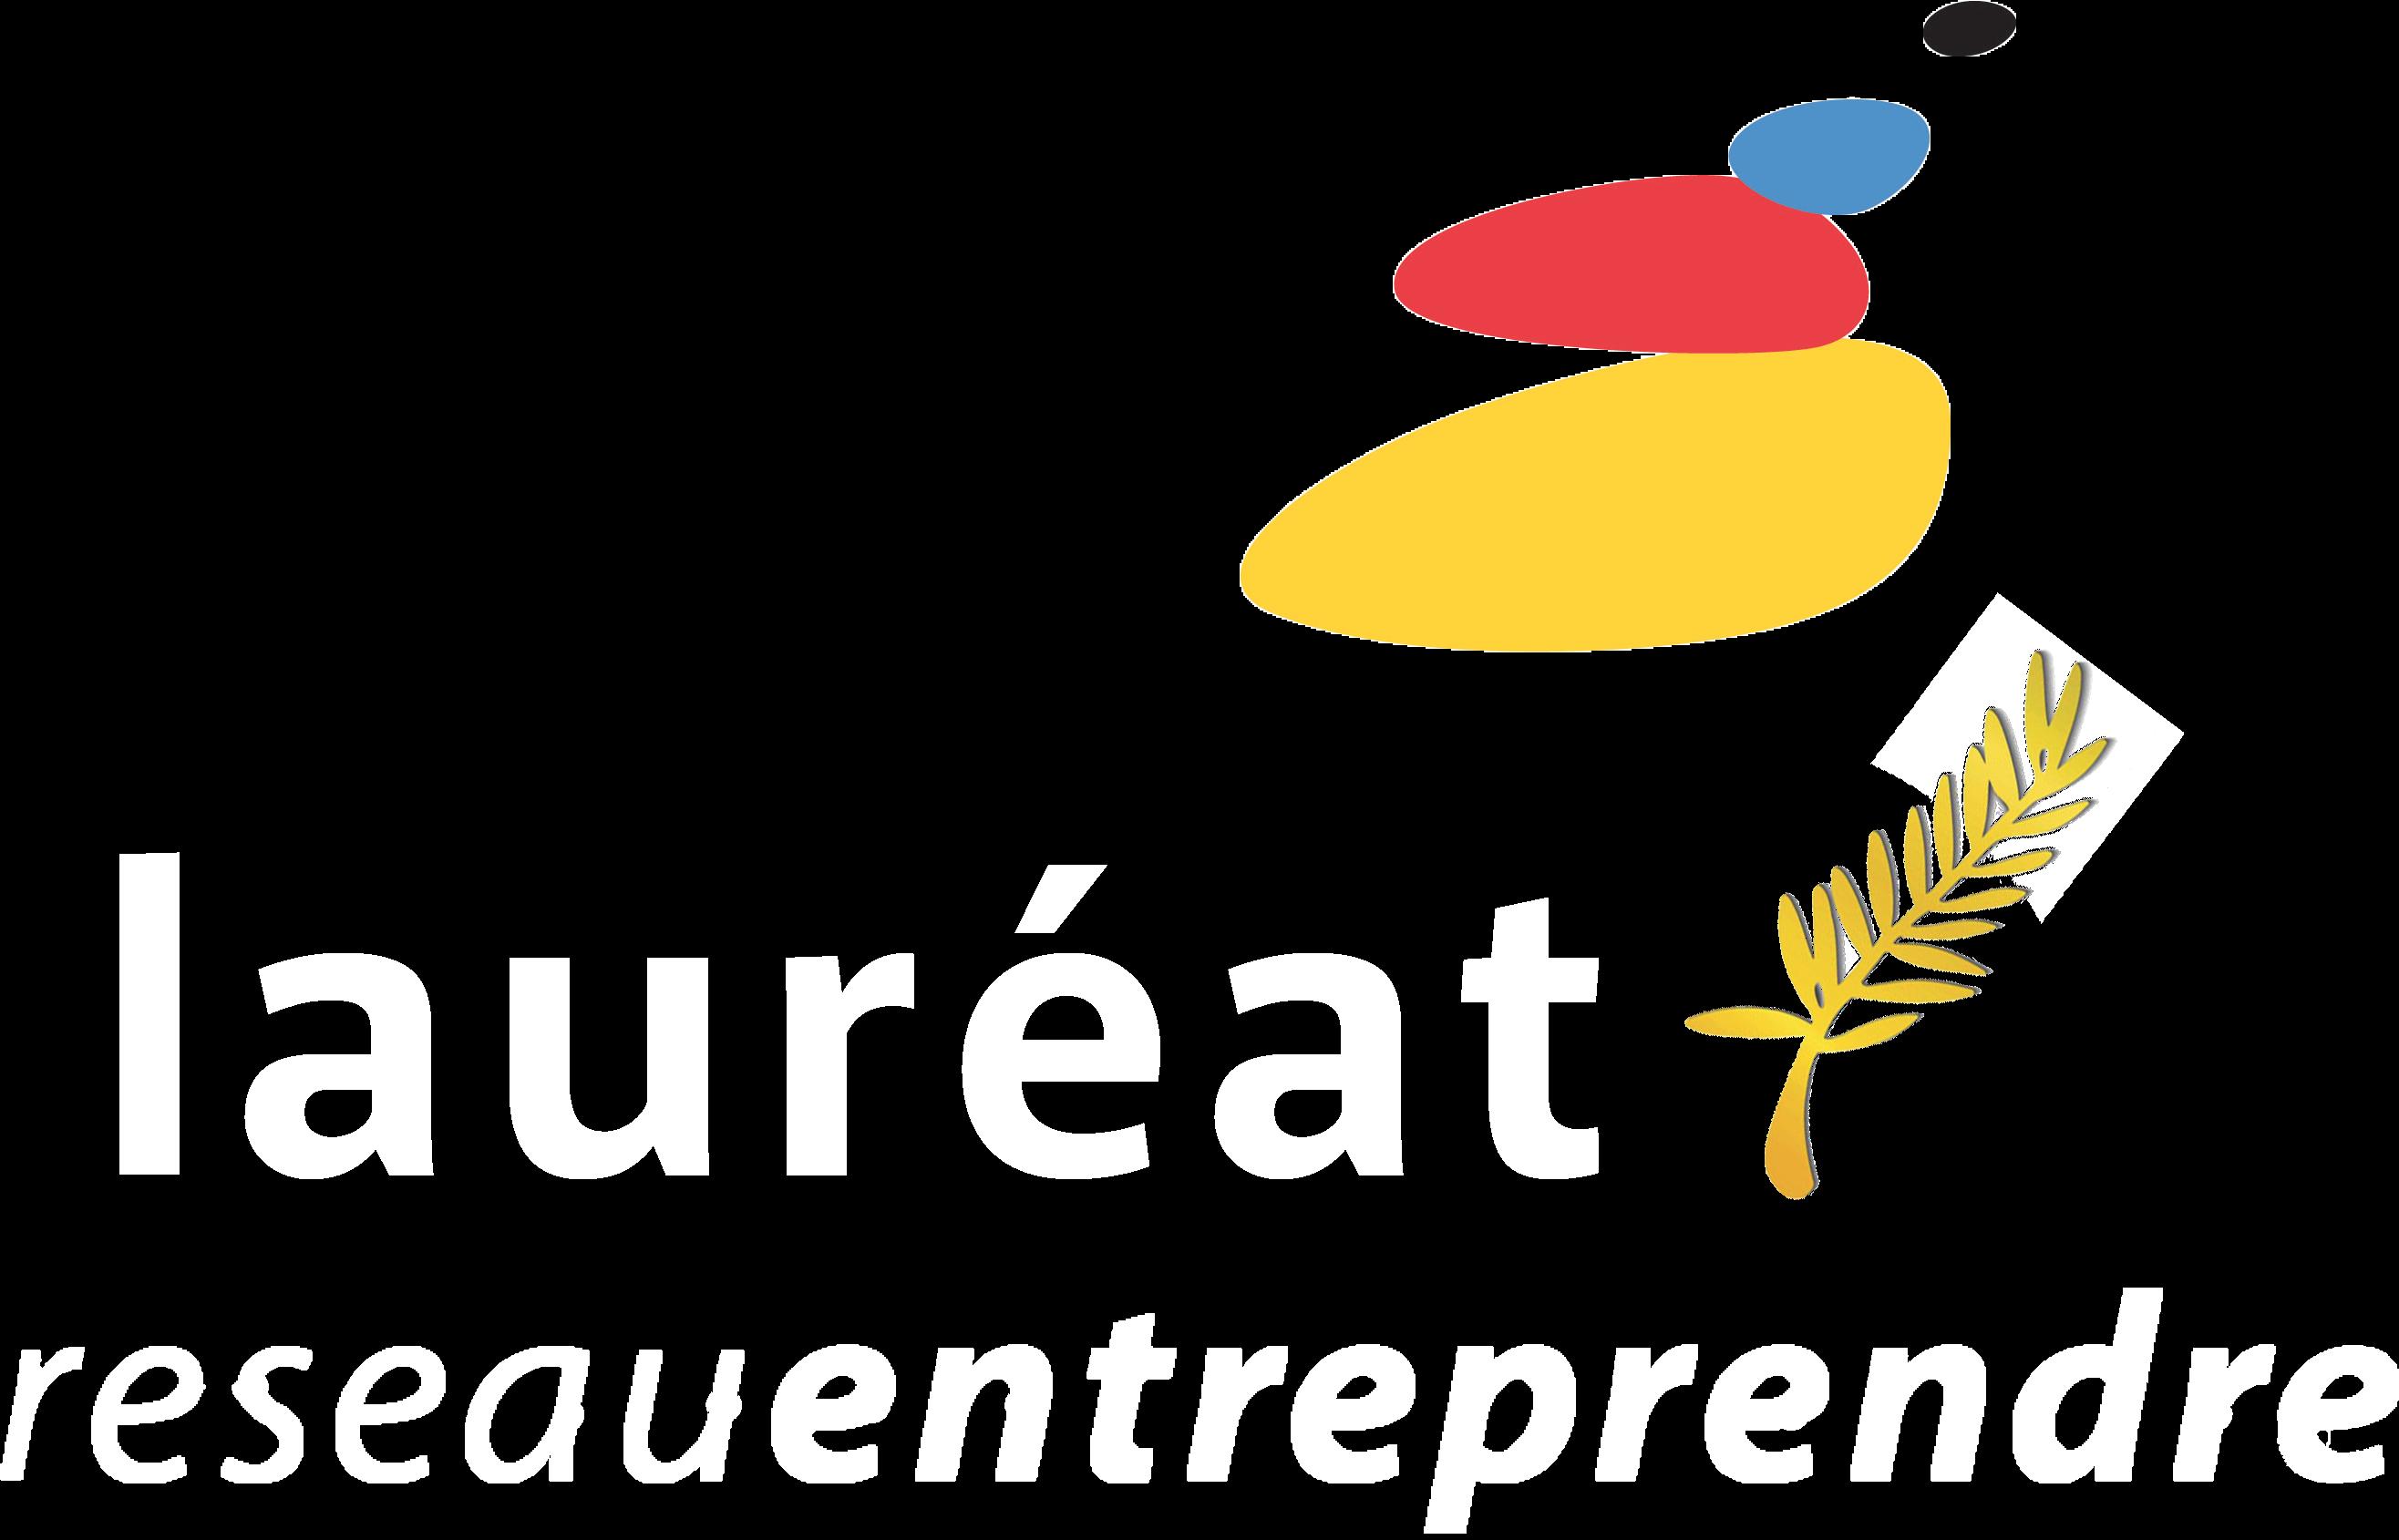 reseau-entreprendre-logo-laureat-1